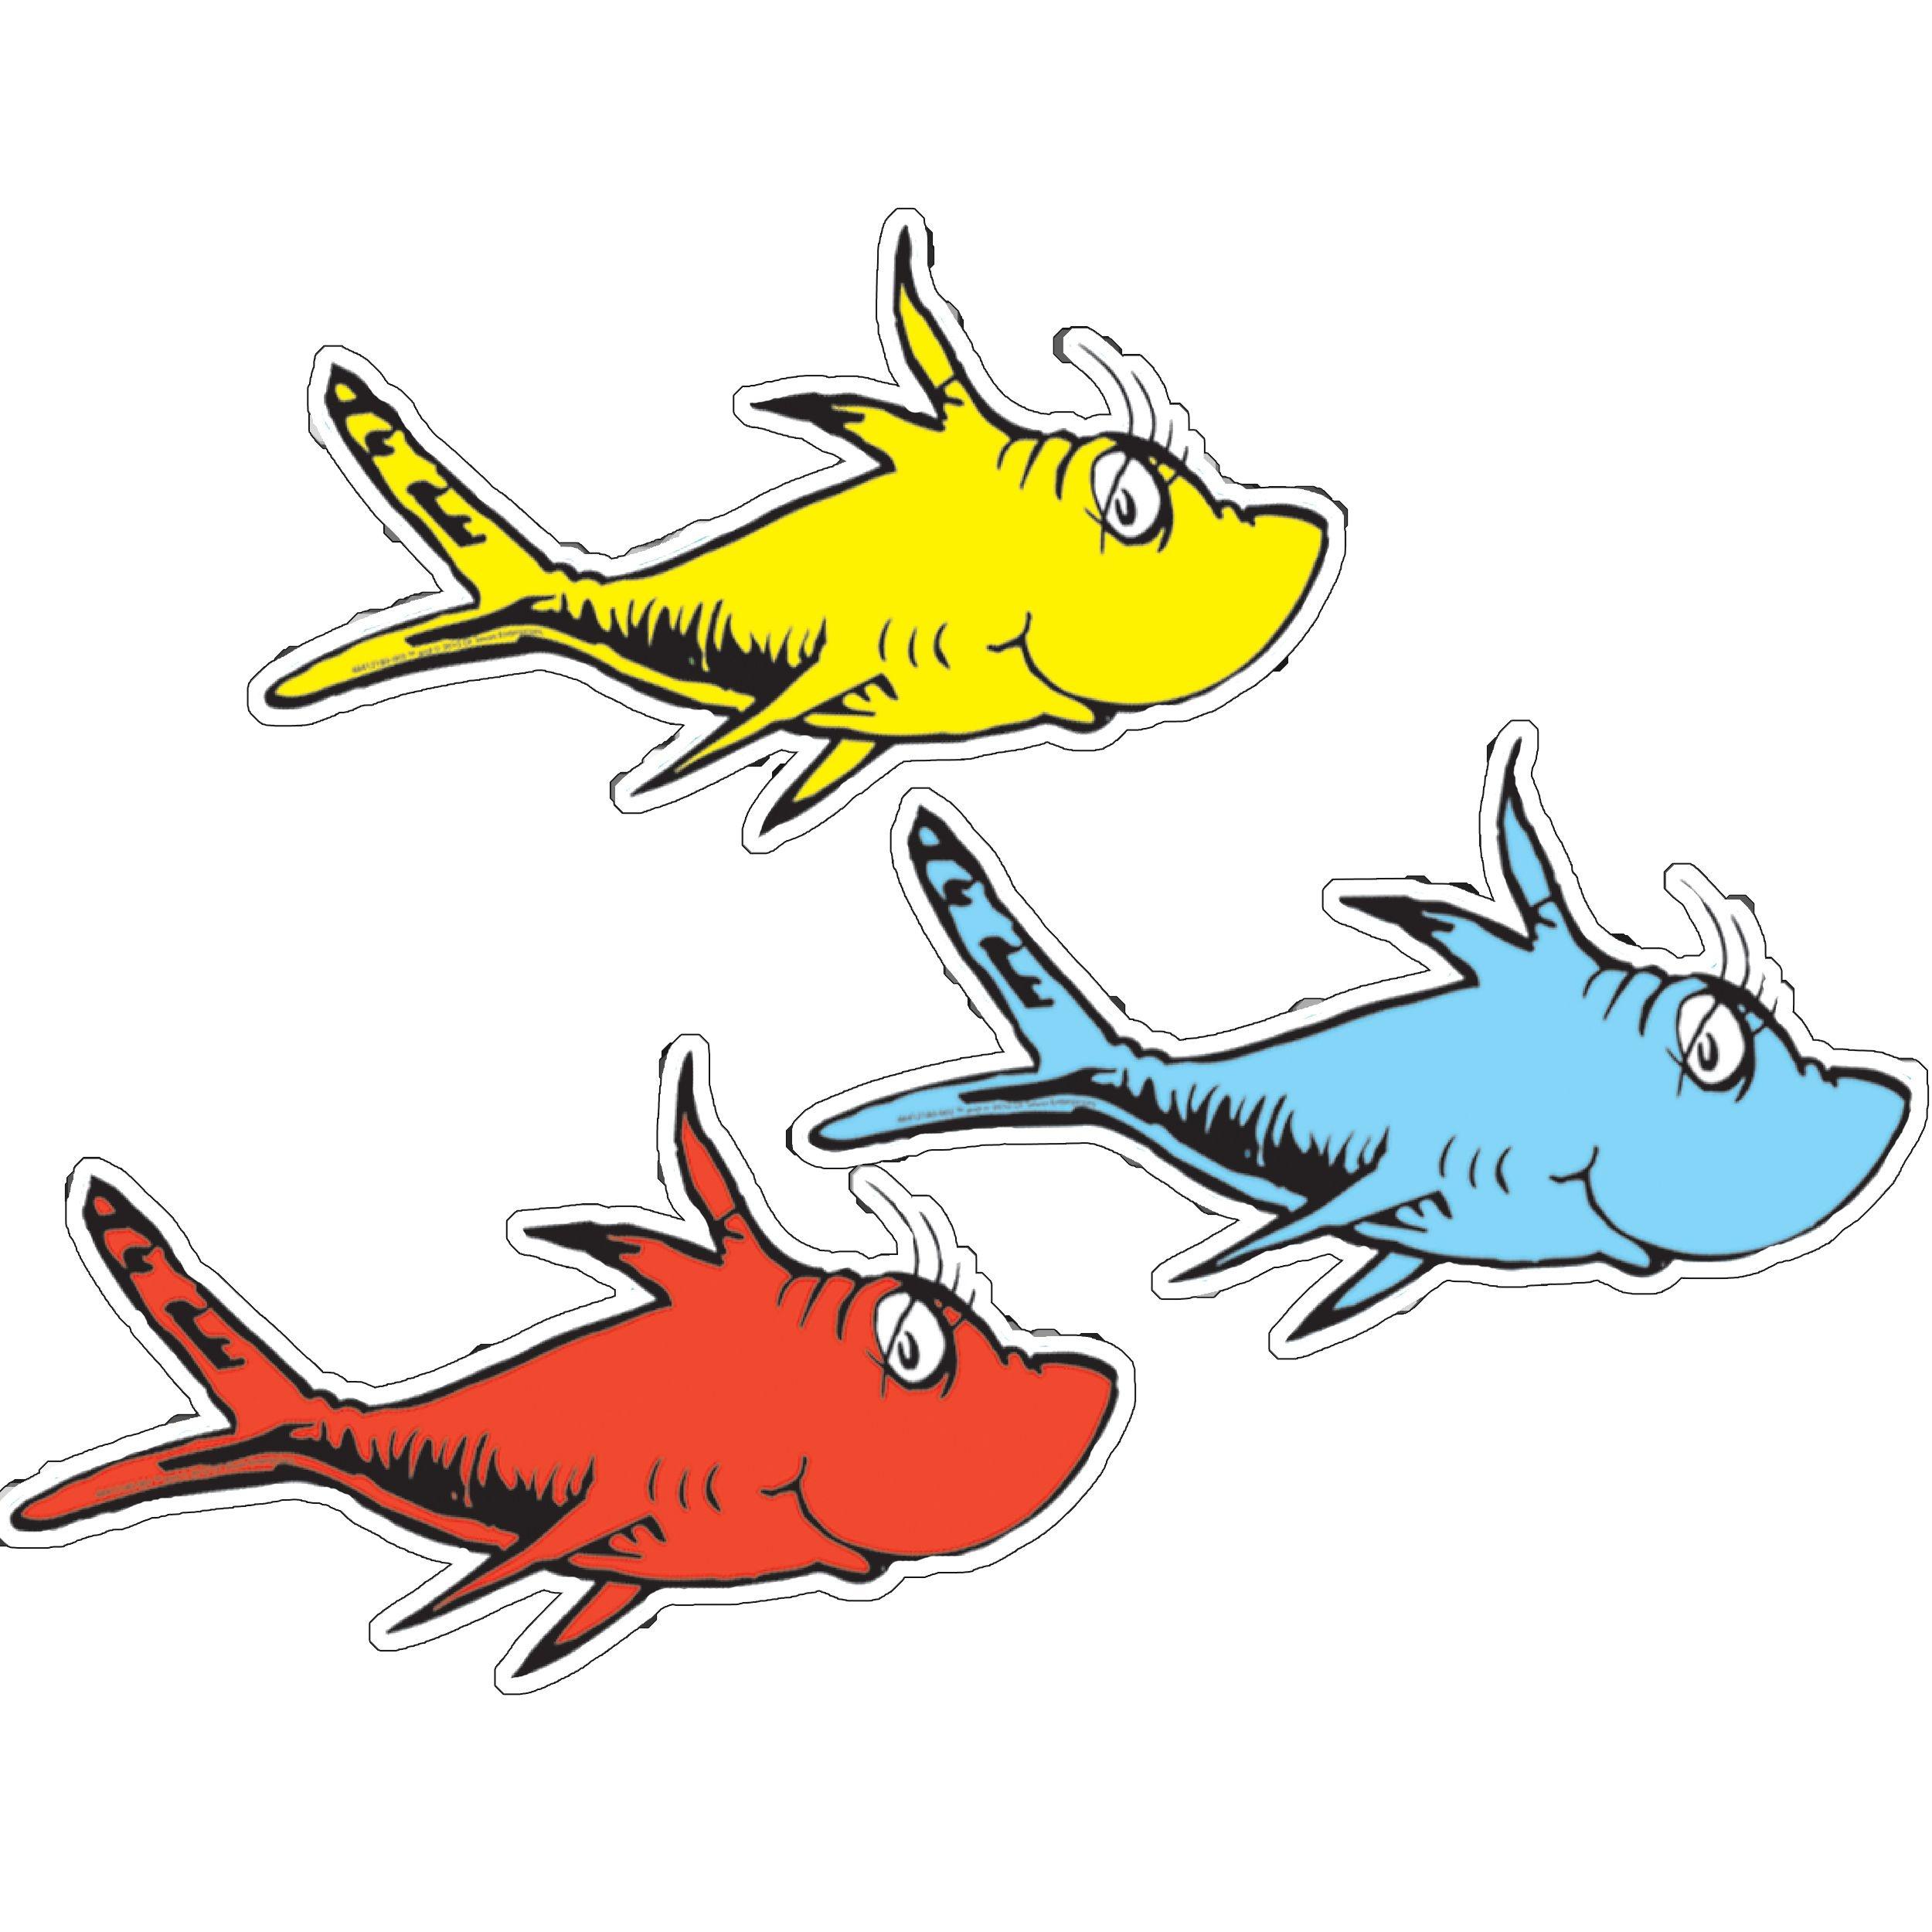 Free Dr. Seuss Printables | View Larger Image | Birthday Parties | 1 - Free Dr Seuss Characters Printables